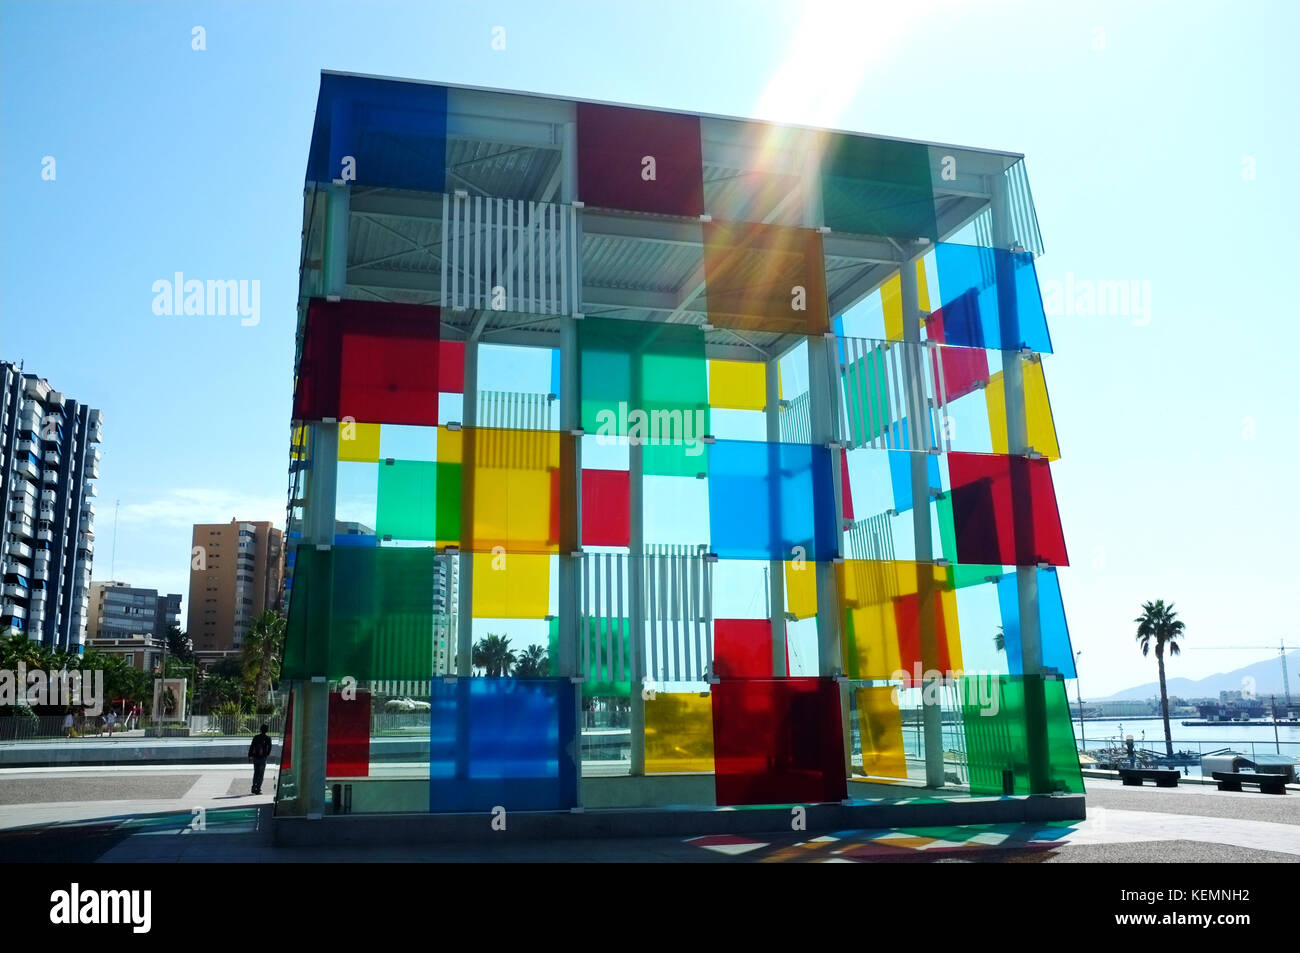 Malaga, Andalucia, Spain, September 2017 - Stock Image